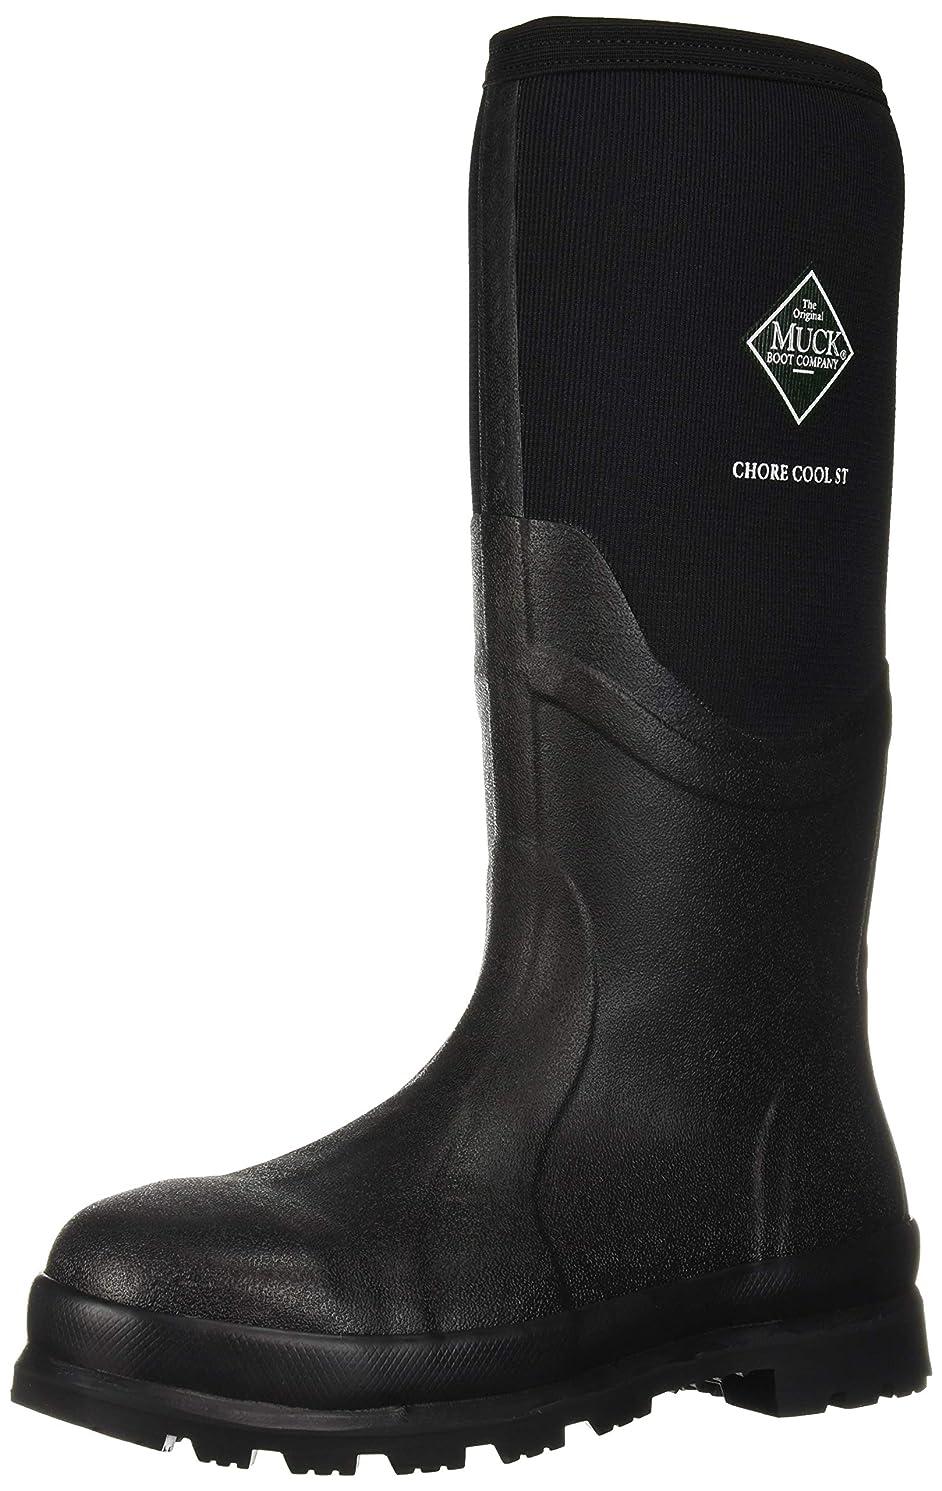 Muck Boot Company Men's Chore Cool Steel Toe Socks